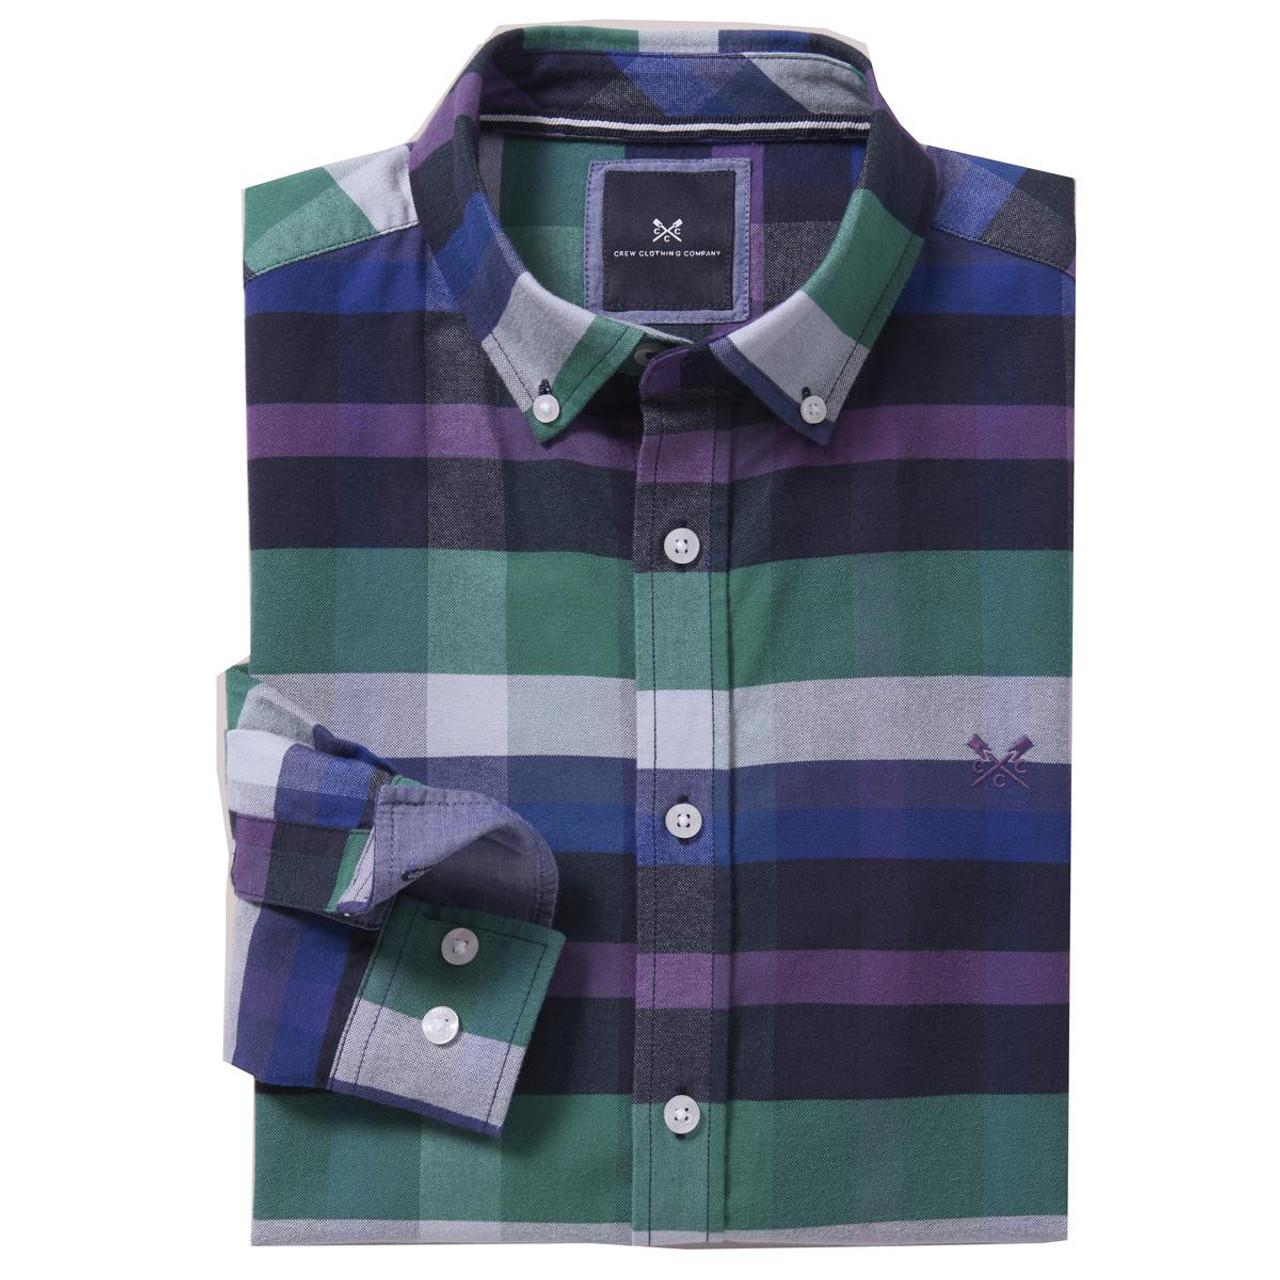 Crew Clothing Thorley Slim Oxford Shirt